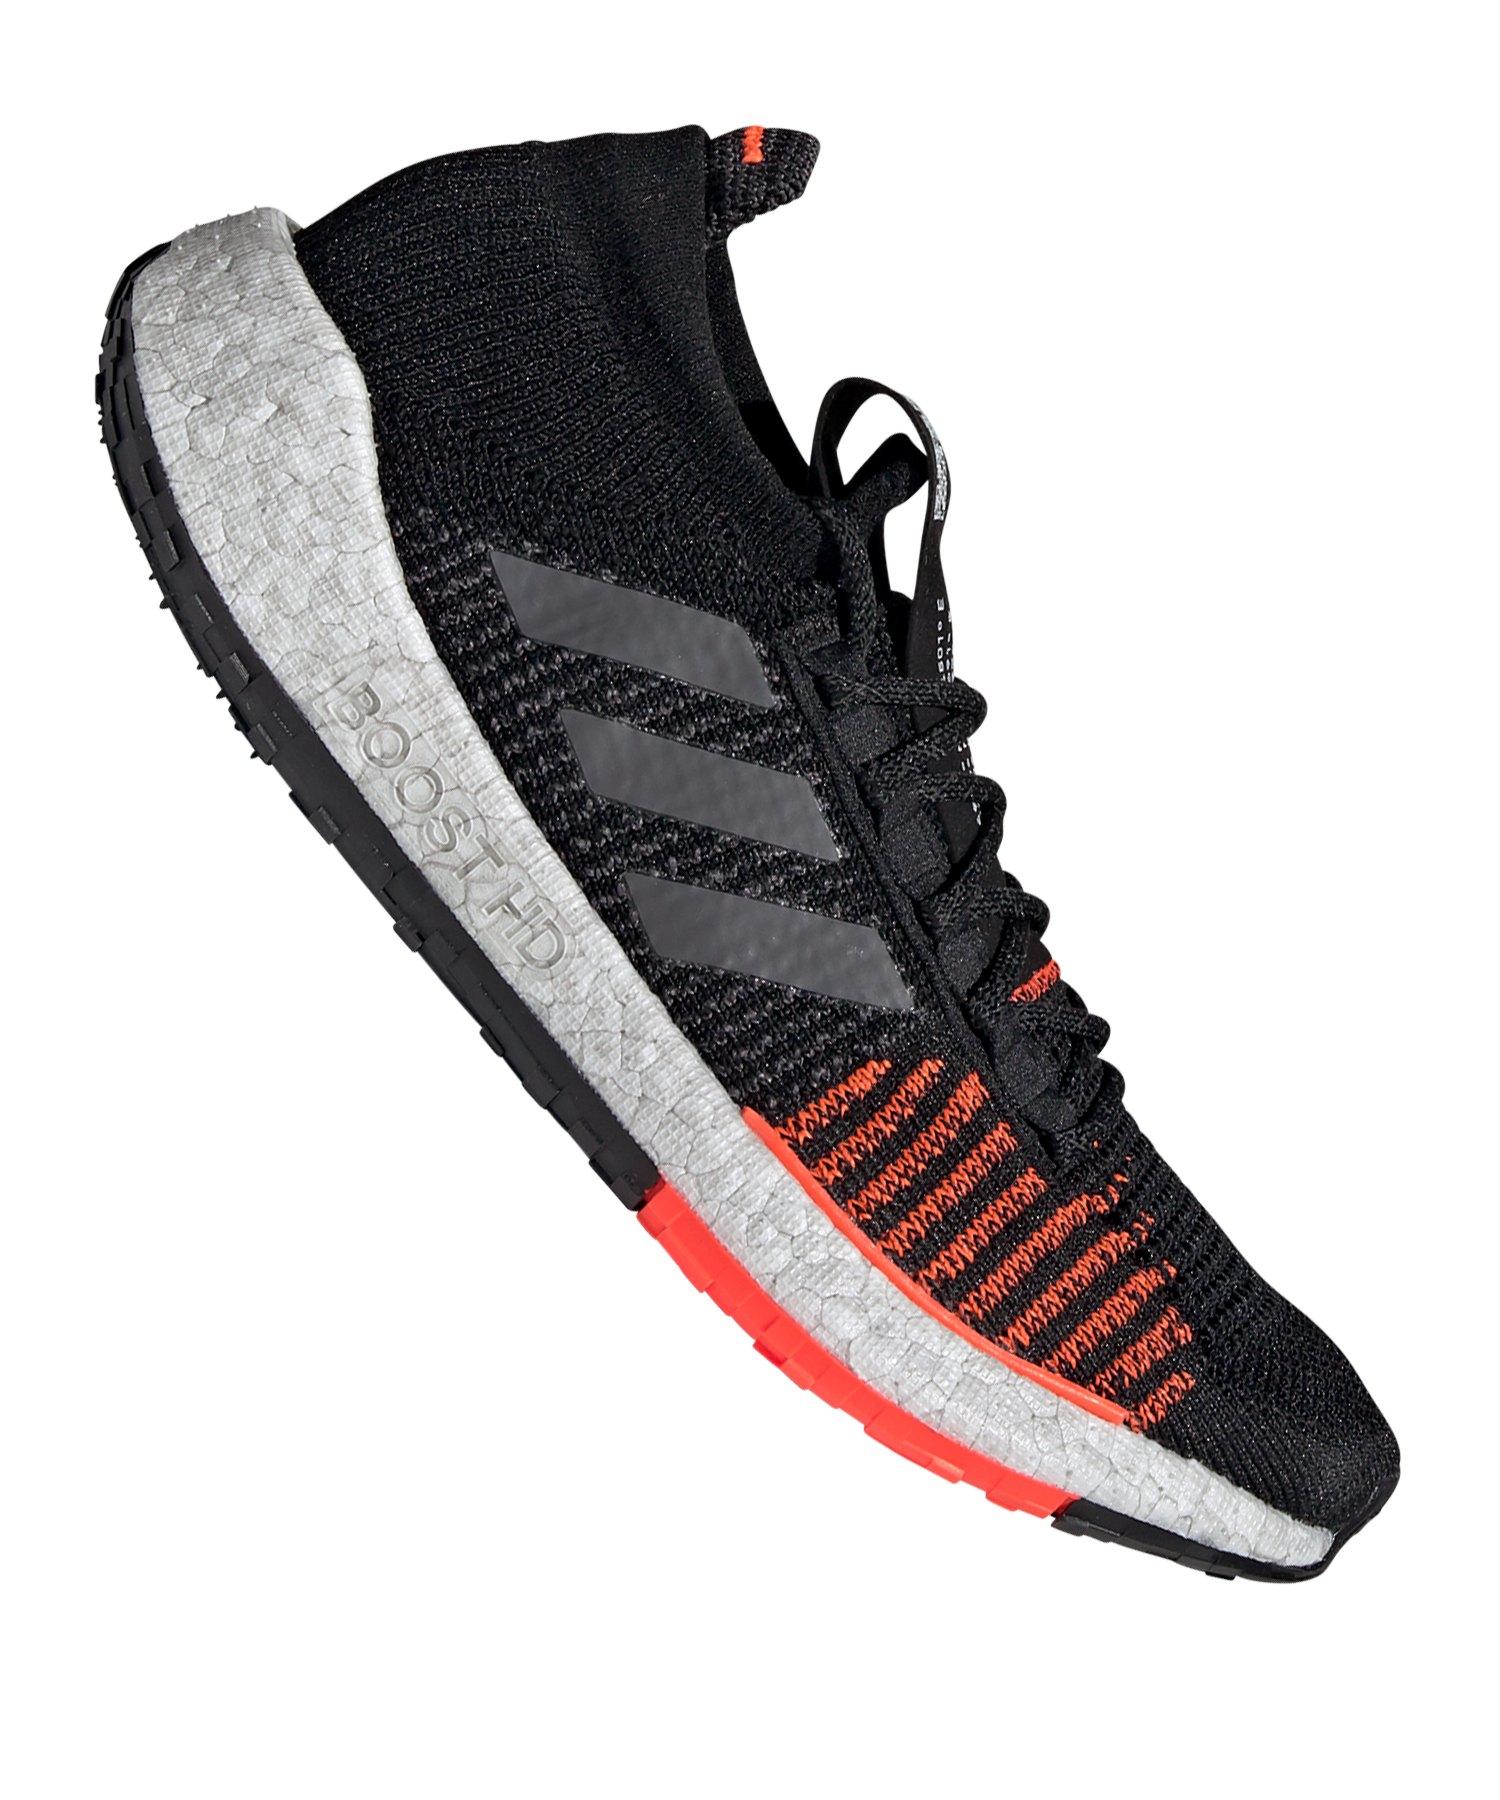 boost schuhe schuhe adidas adidas boost adidas trail schuhe boost trail trail adidas MGqpUVSz